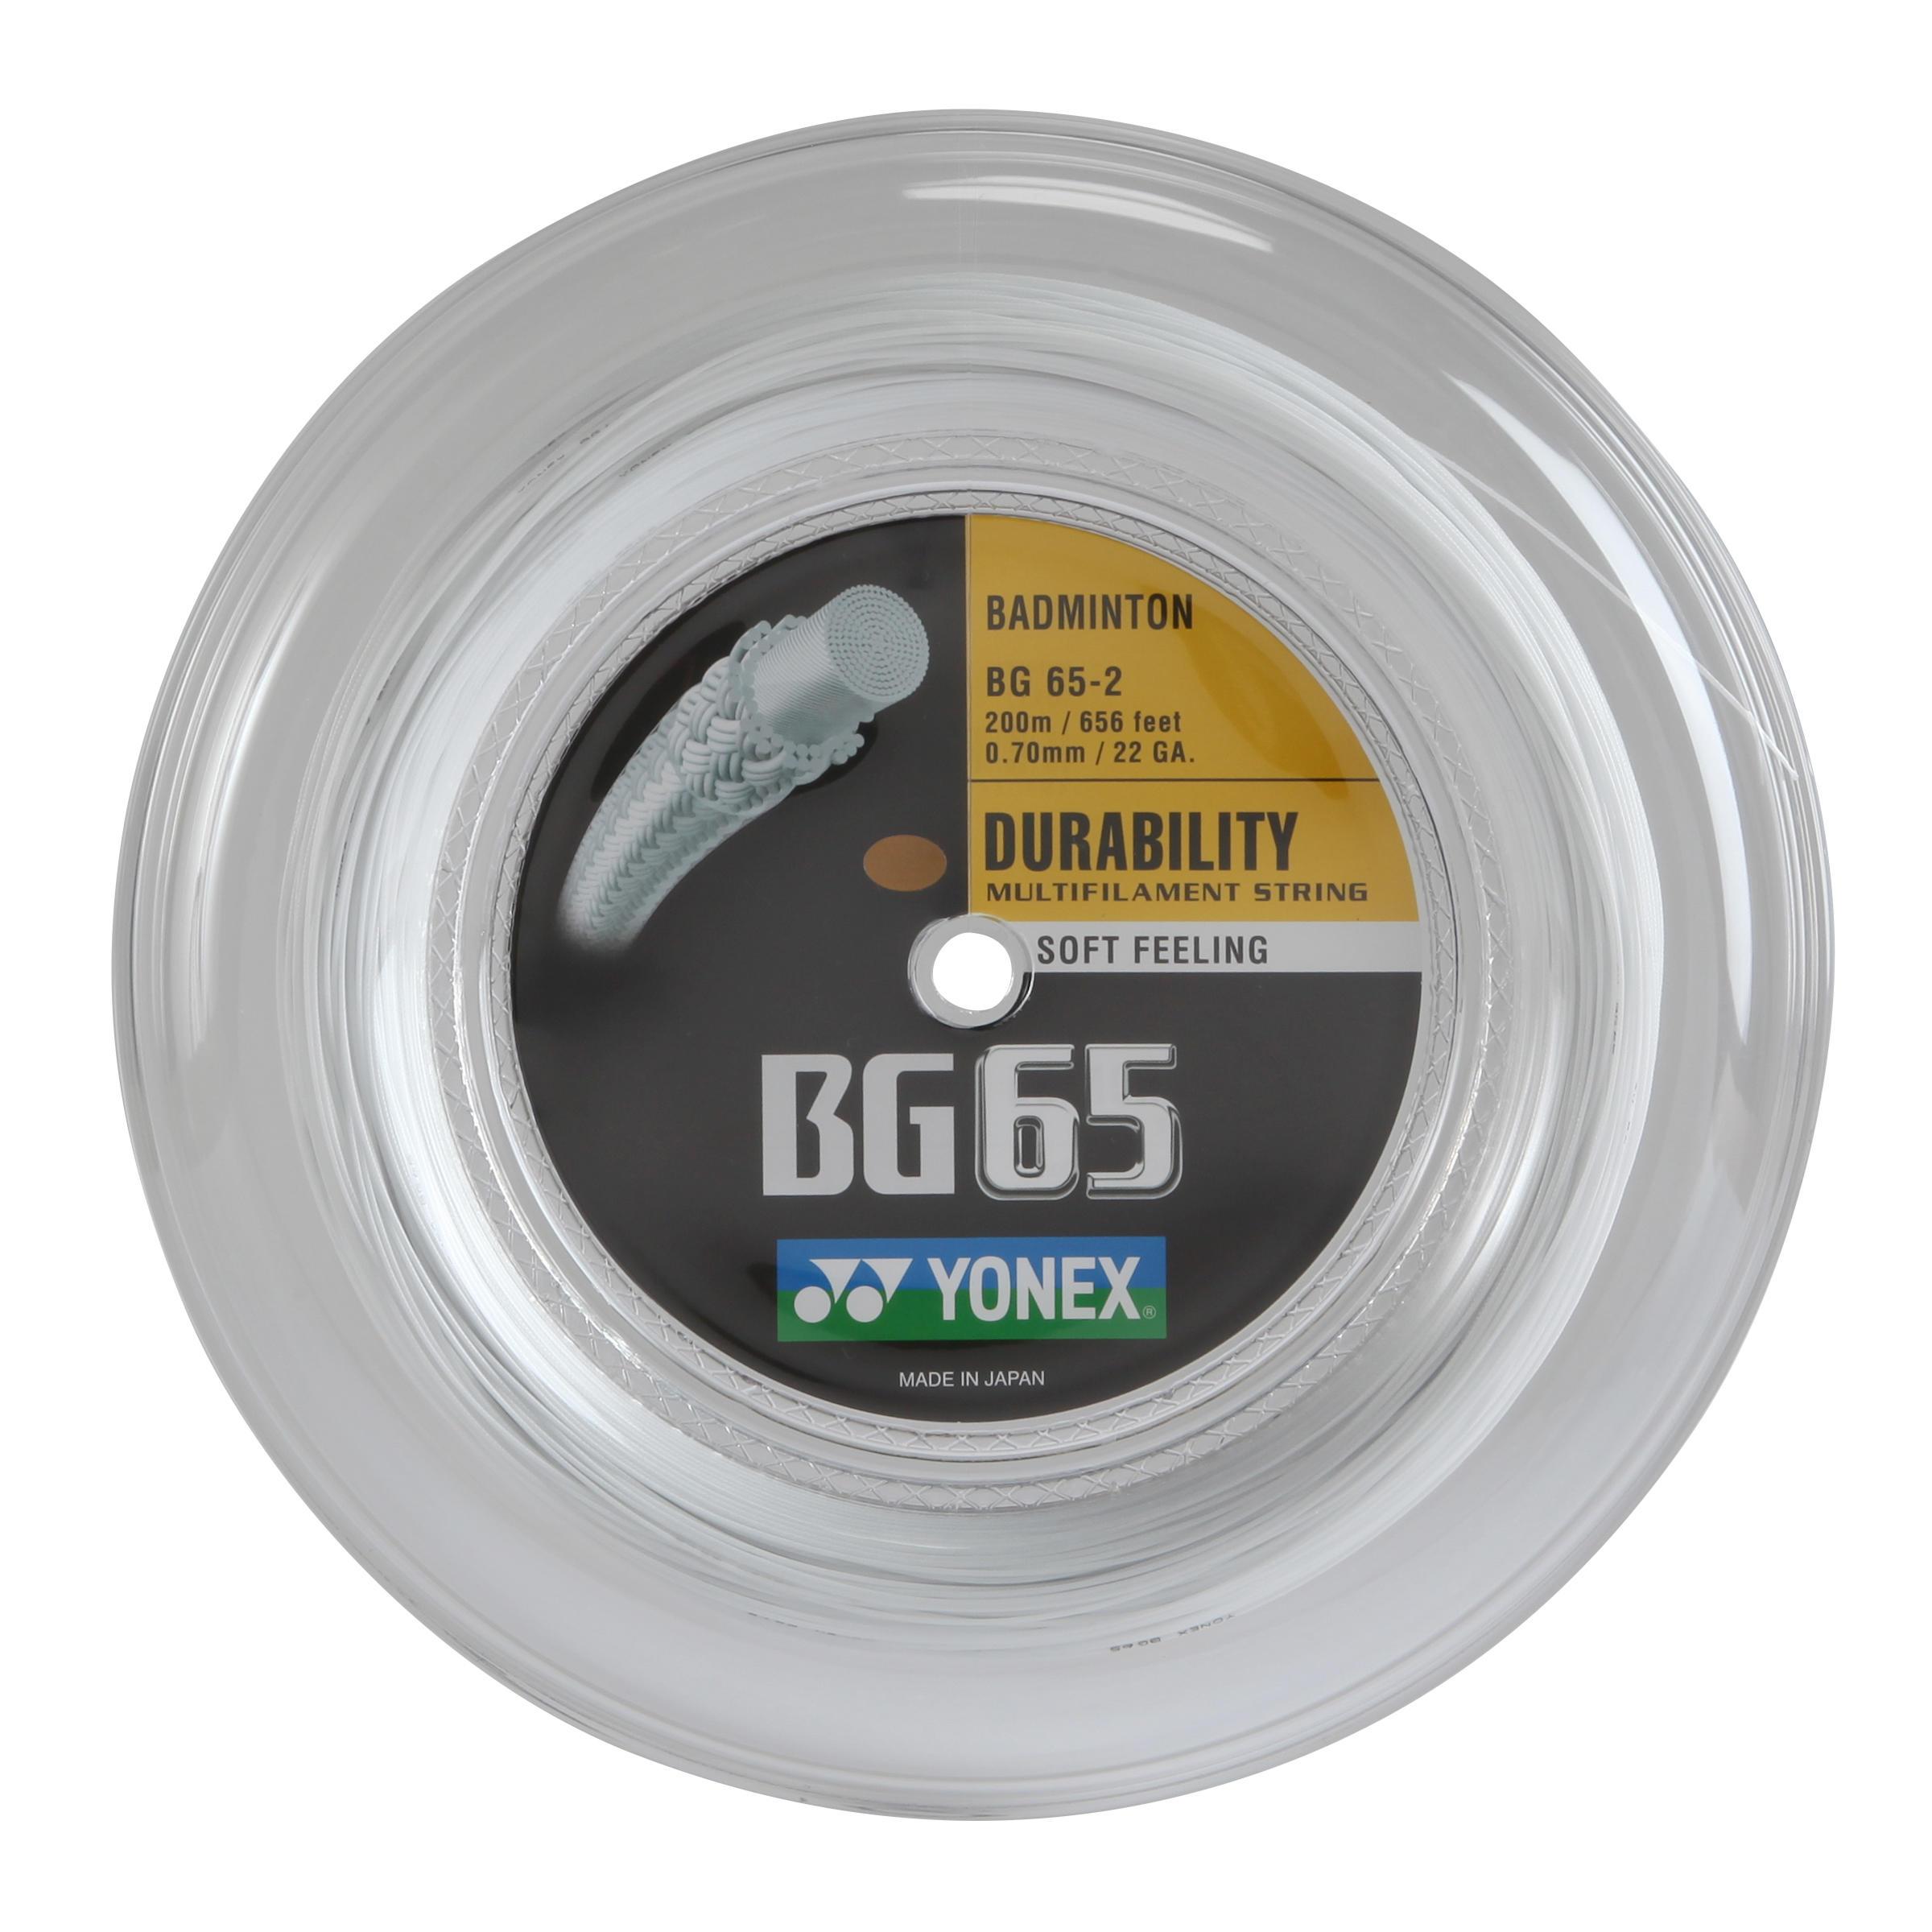 Yonex Badmintonbespanning BG65 wit kopen